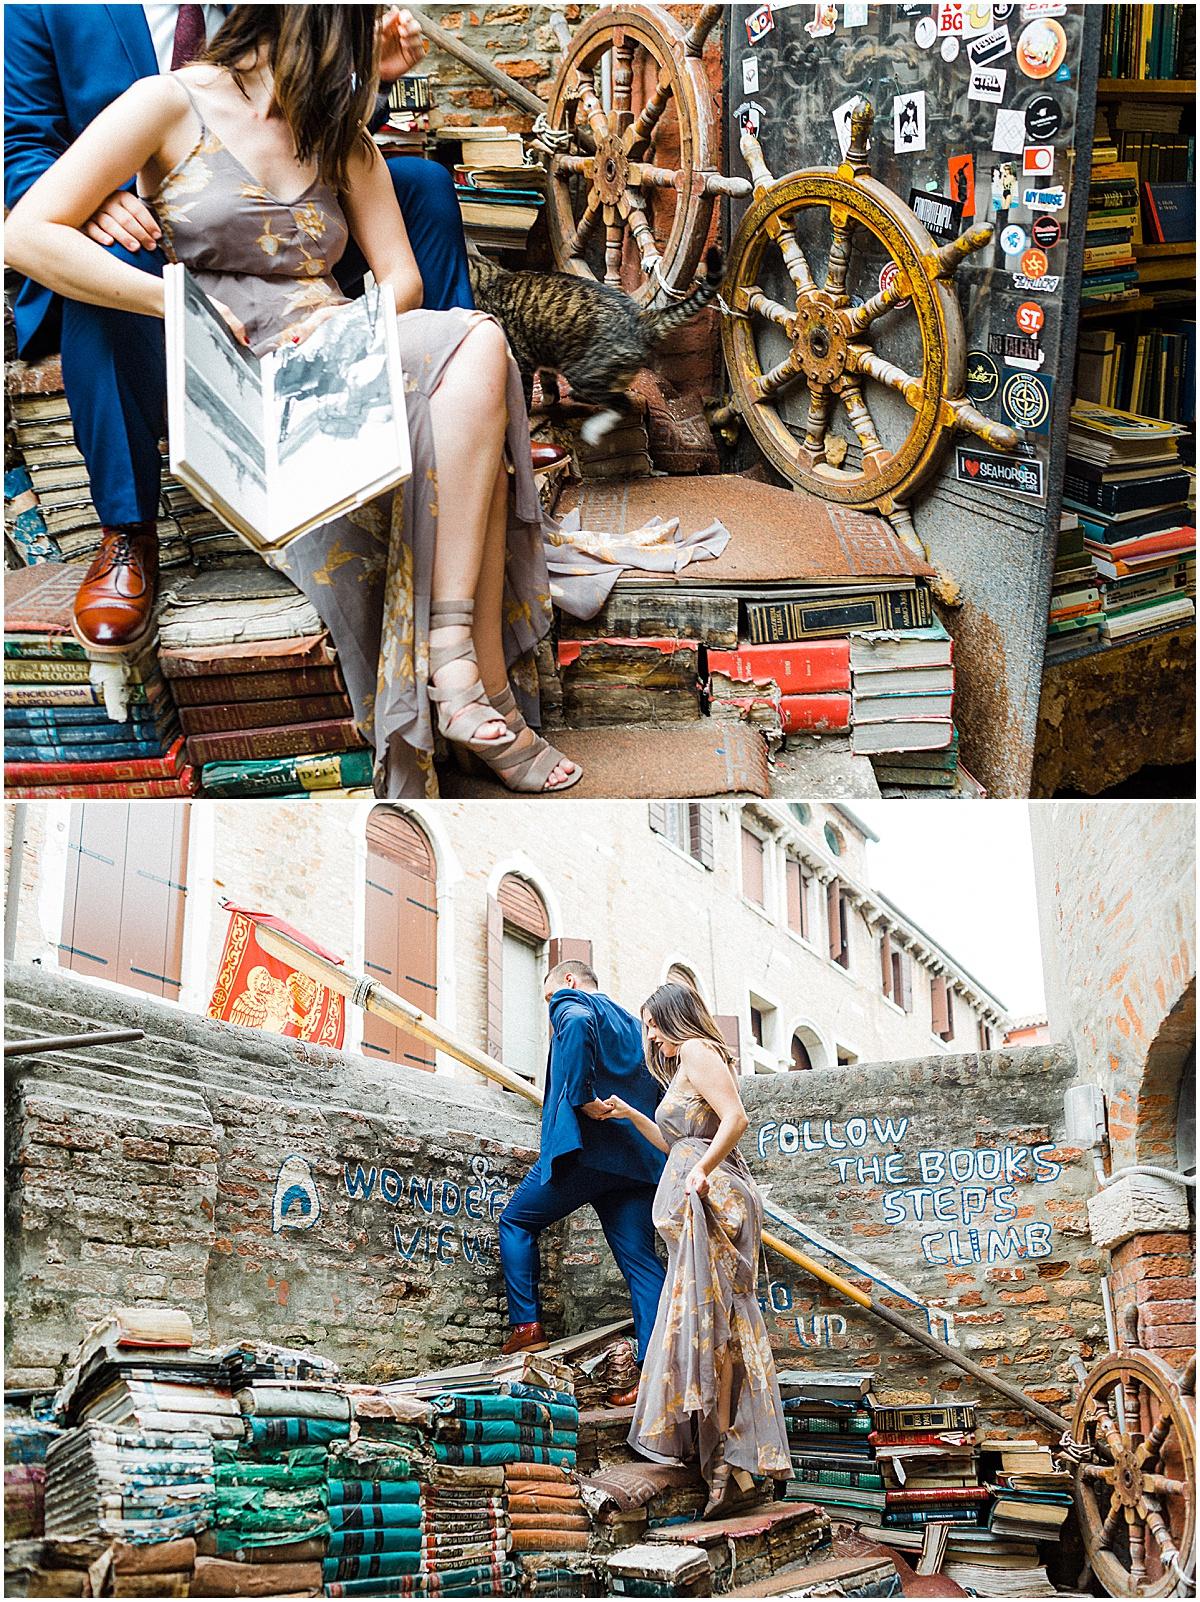 lifestyle-portrait-photography-couple-in-venice-gondola-sunrise-stefano-degirmenci_0223.jpg